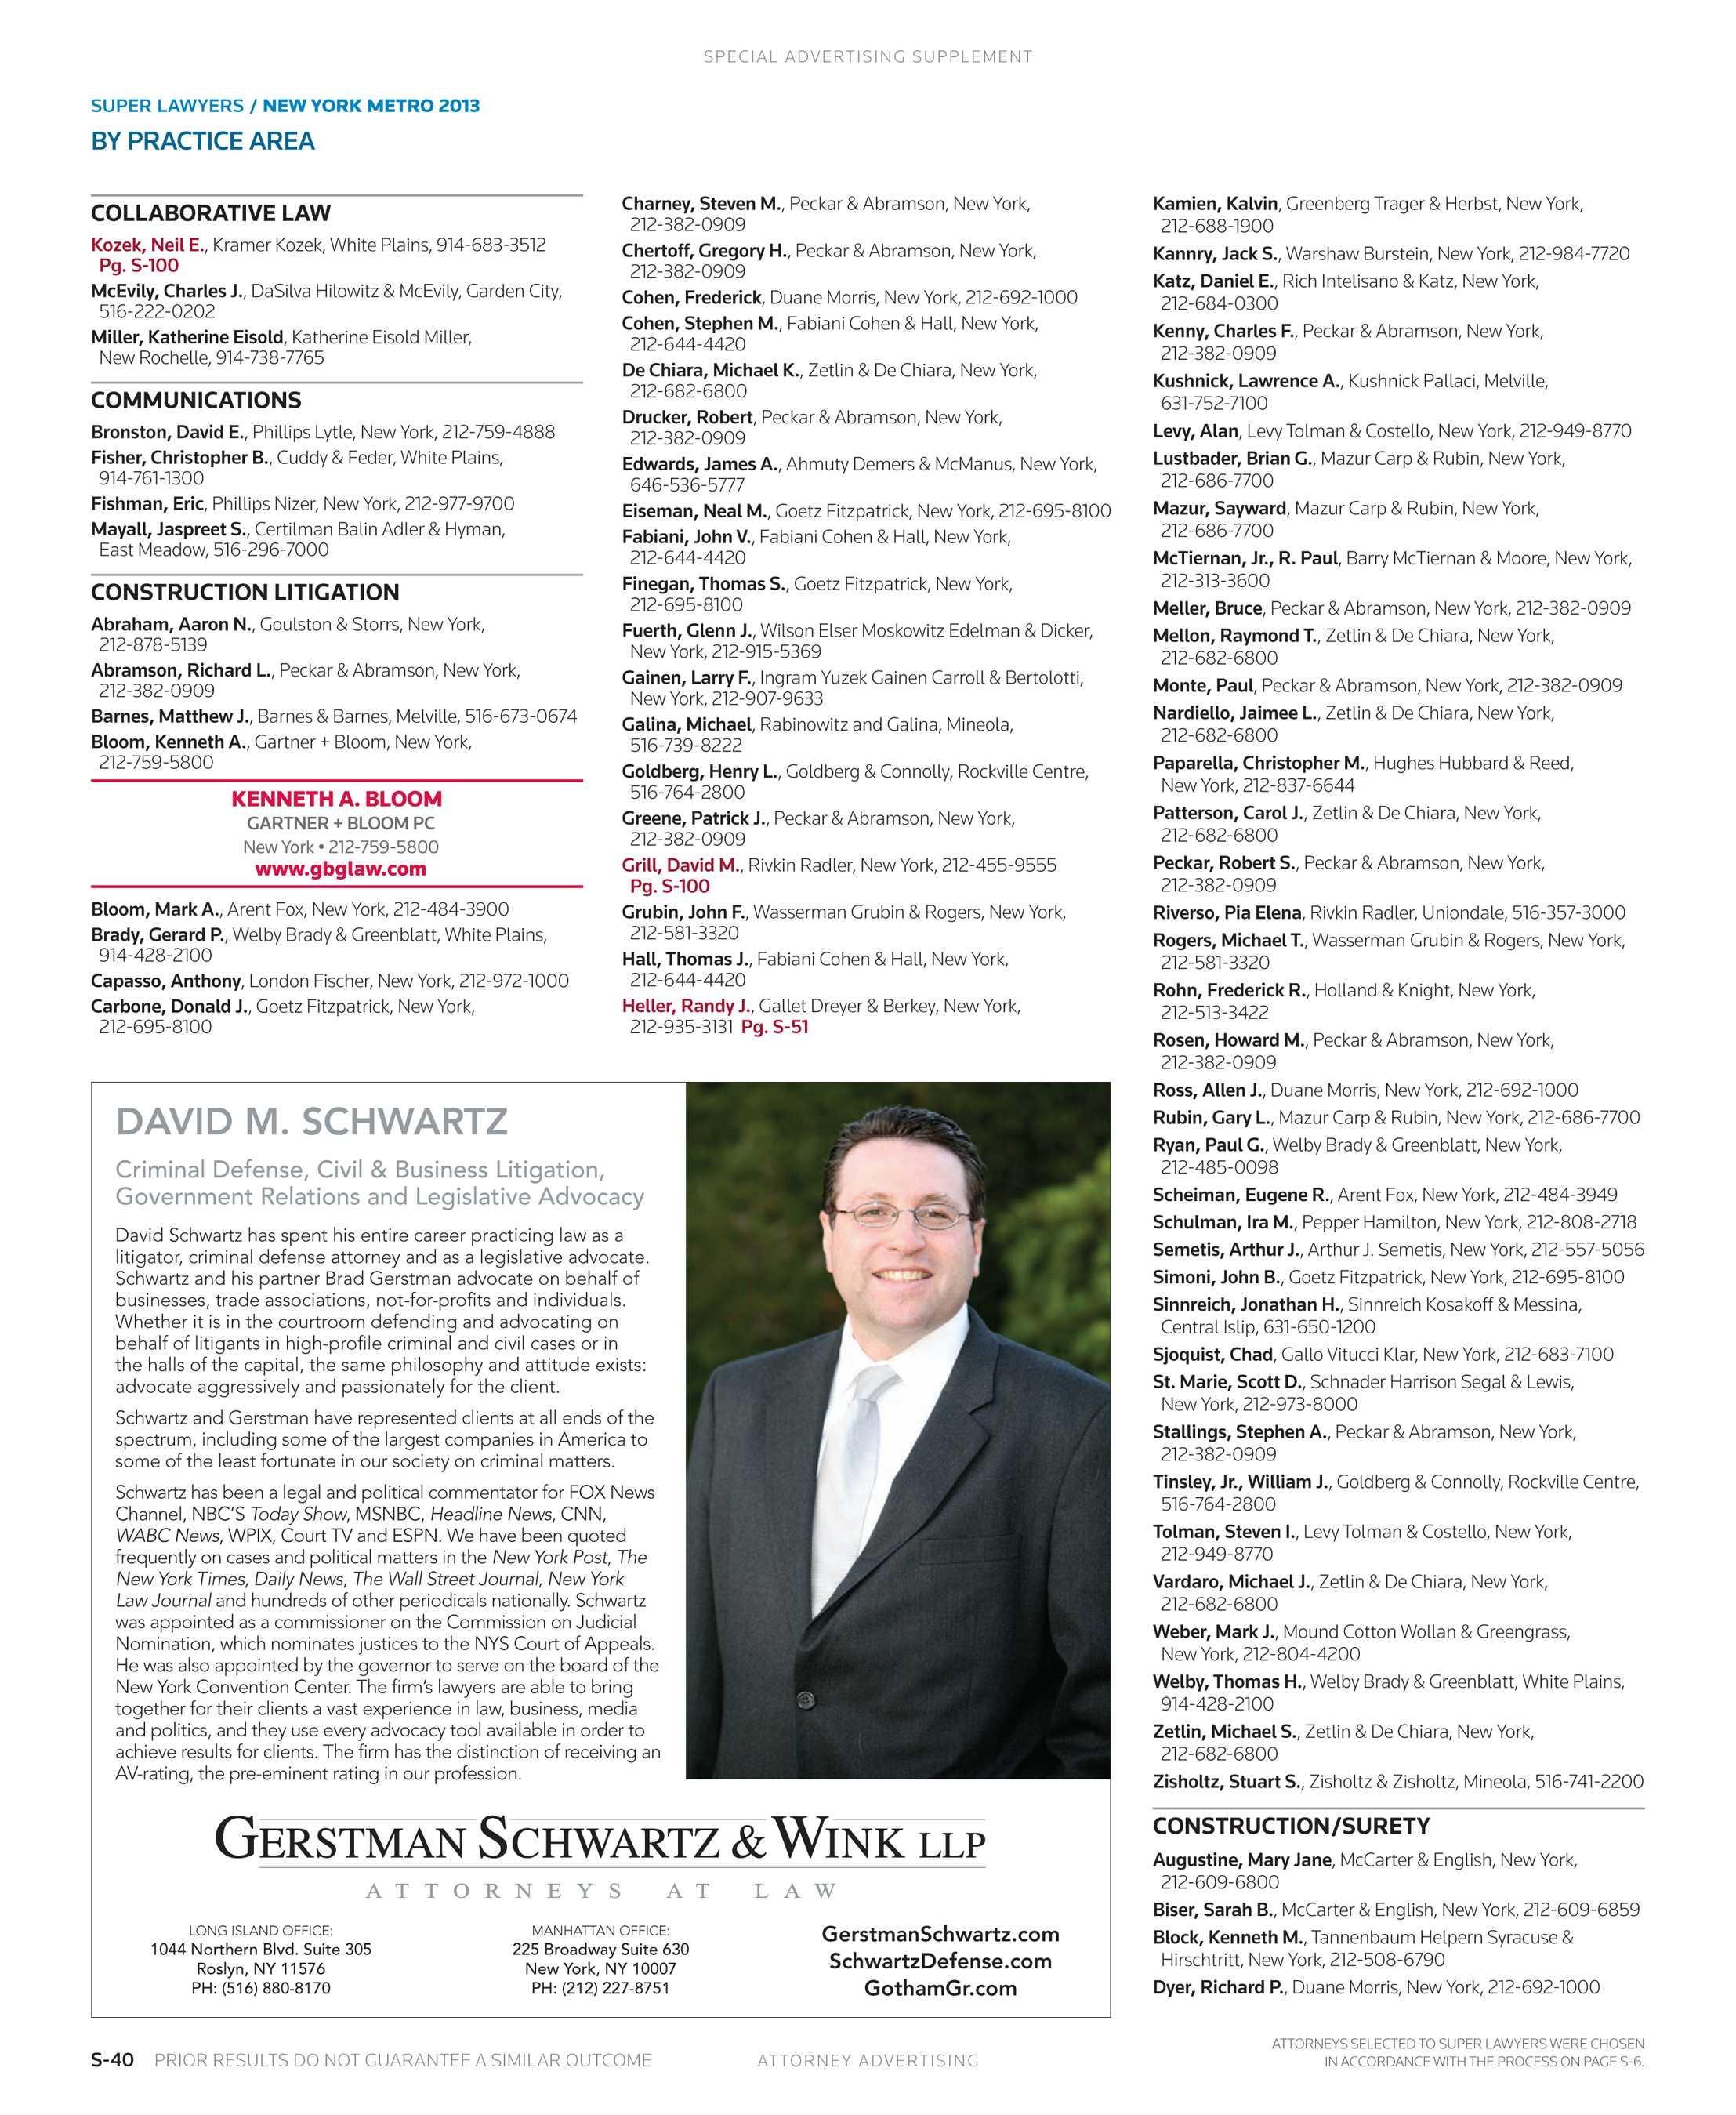 Metro Tannenbaum.Super Lawyers New York Metro 2013 Supplement To The New York